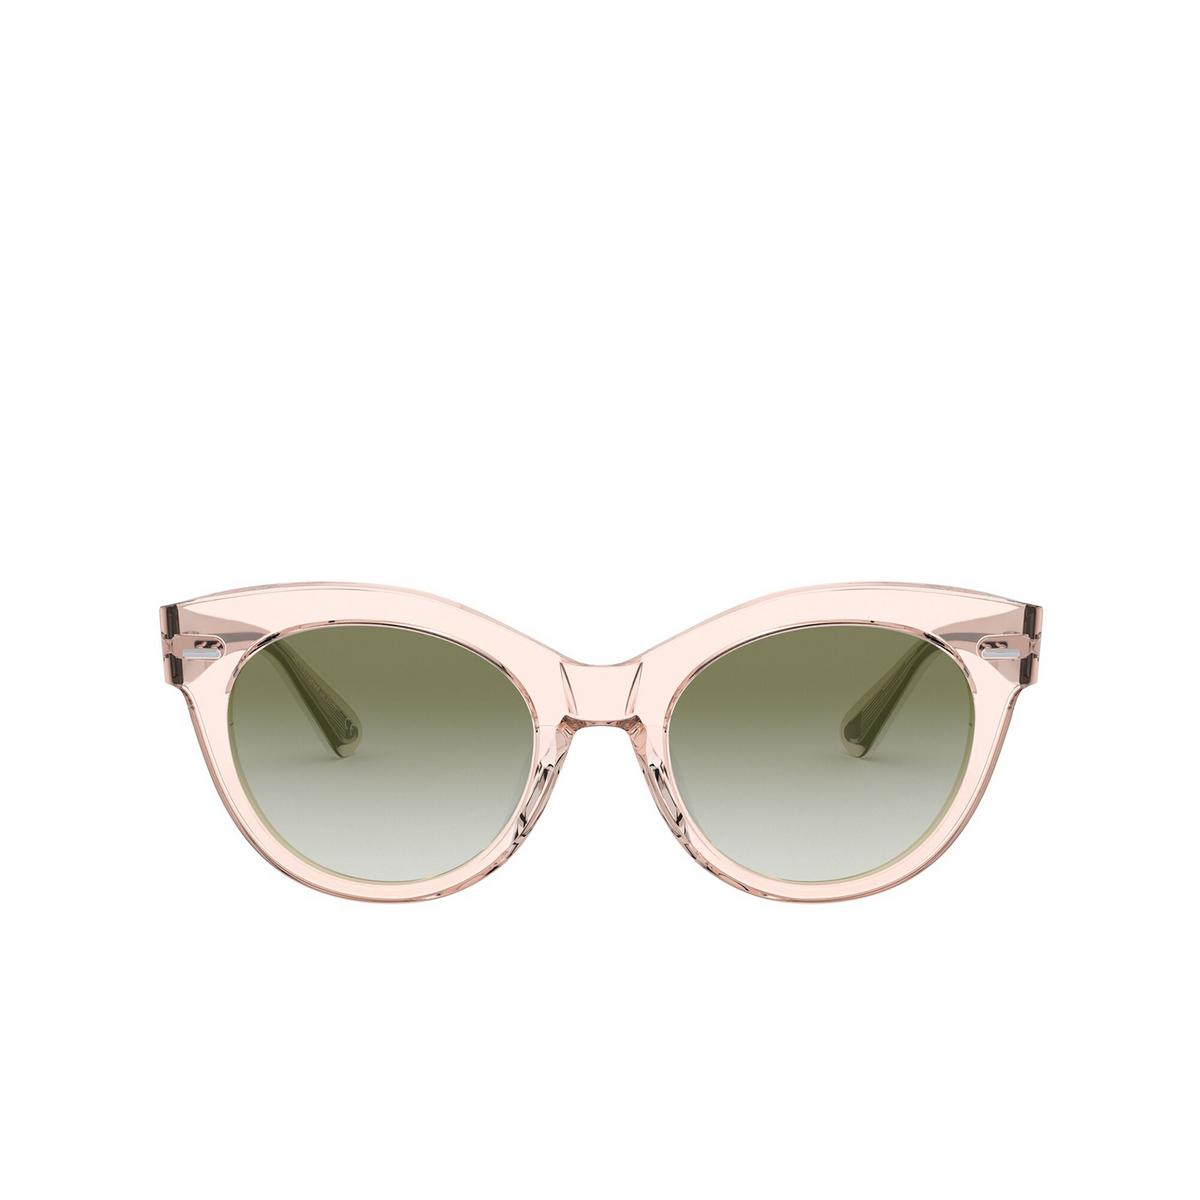 Oliver Peoples® Round Sunglasses: Georgica OV5421SU color Light Silk 16528E - front view.